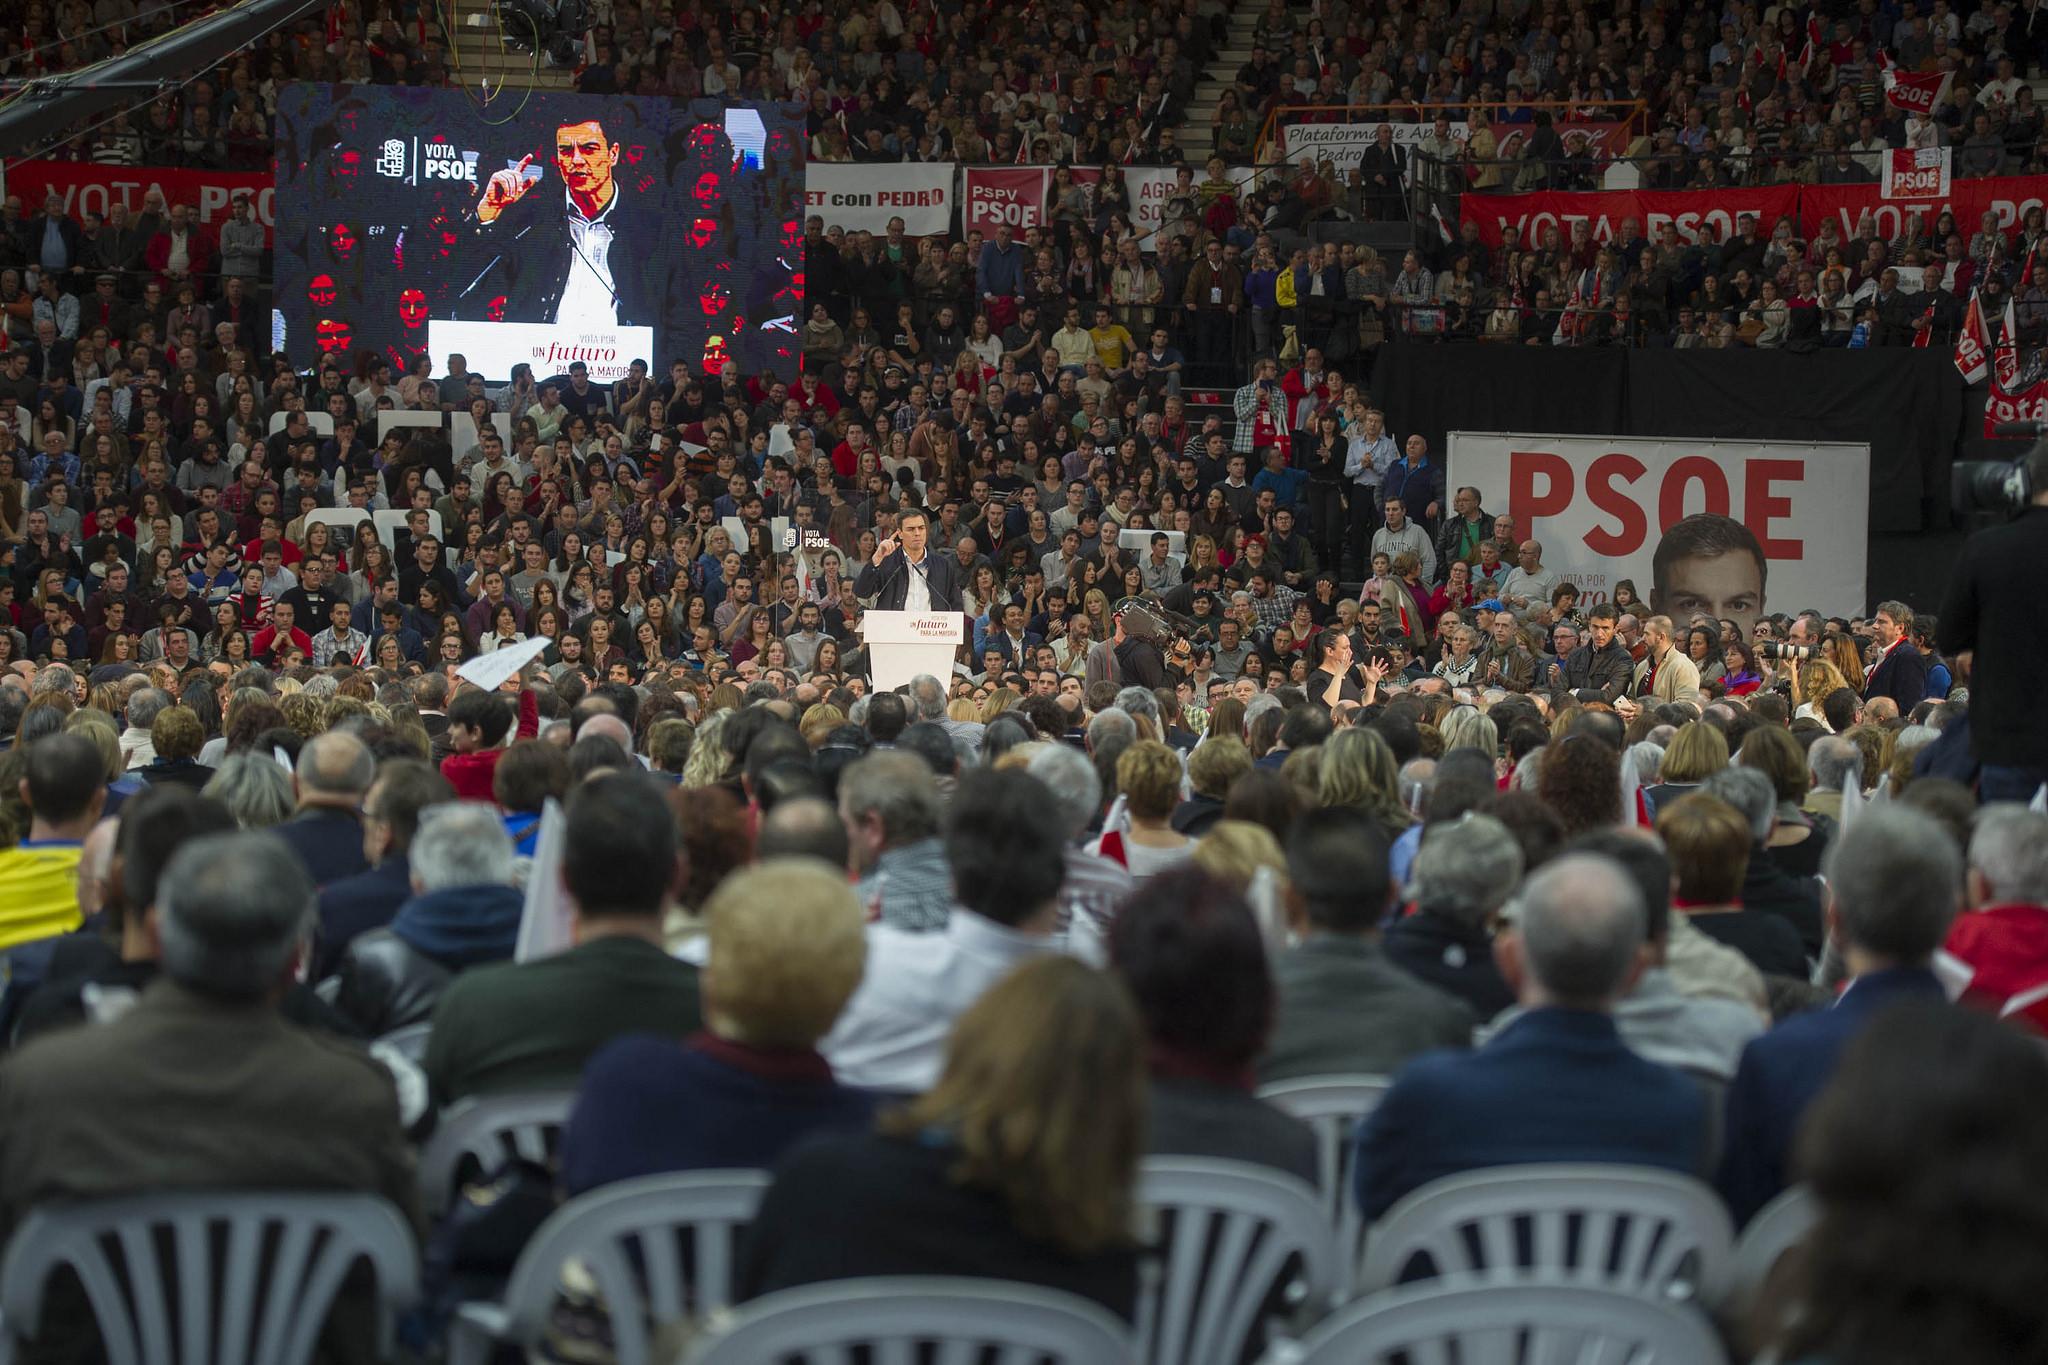 Mitin del Pedro Sánchez, líder del PSOE